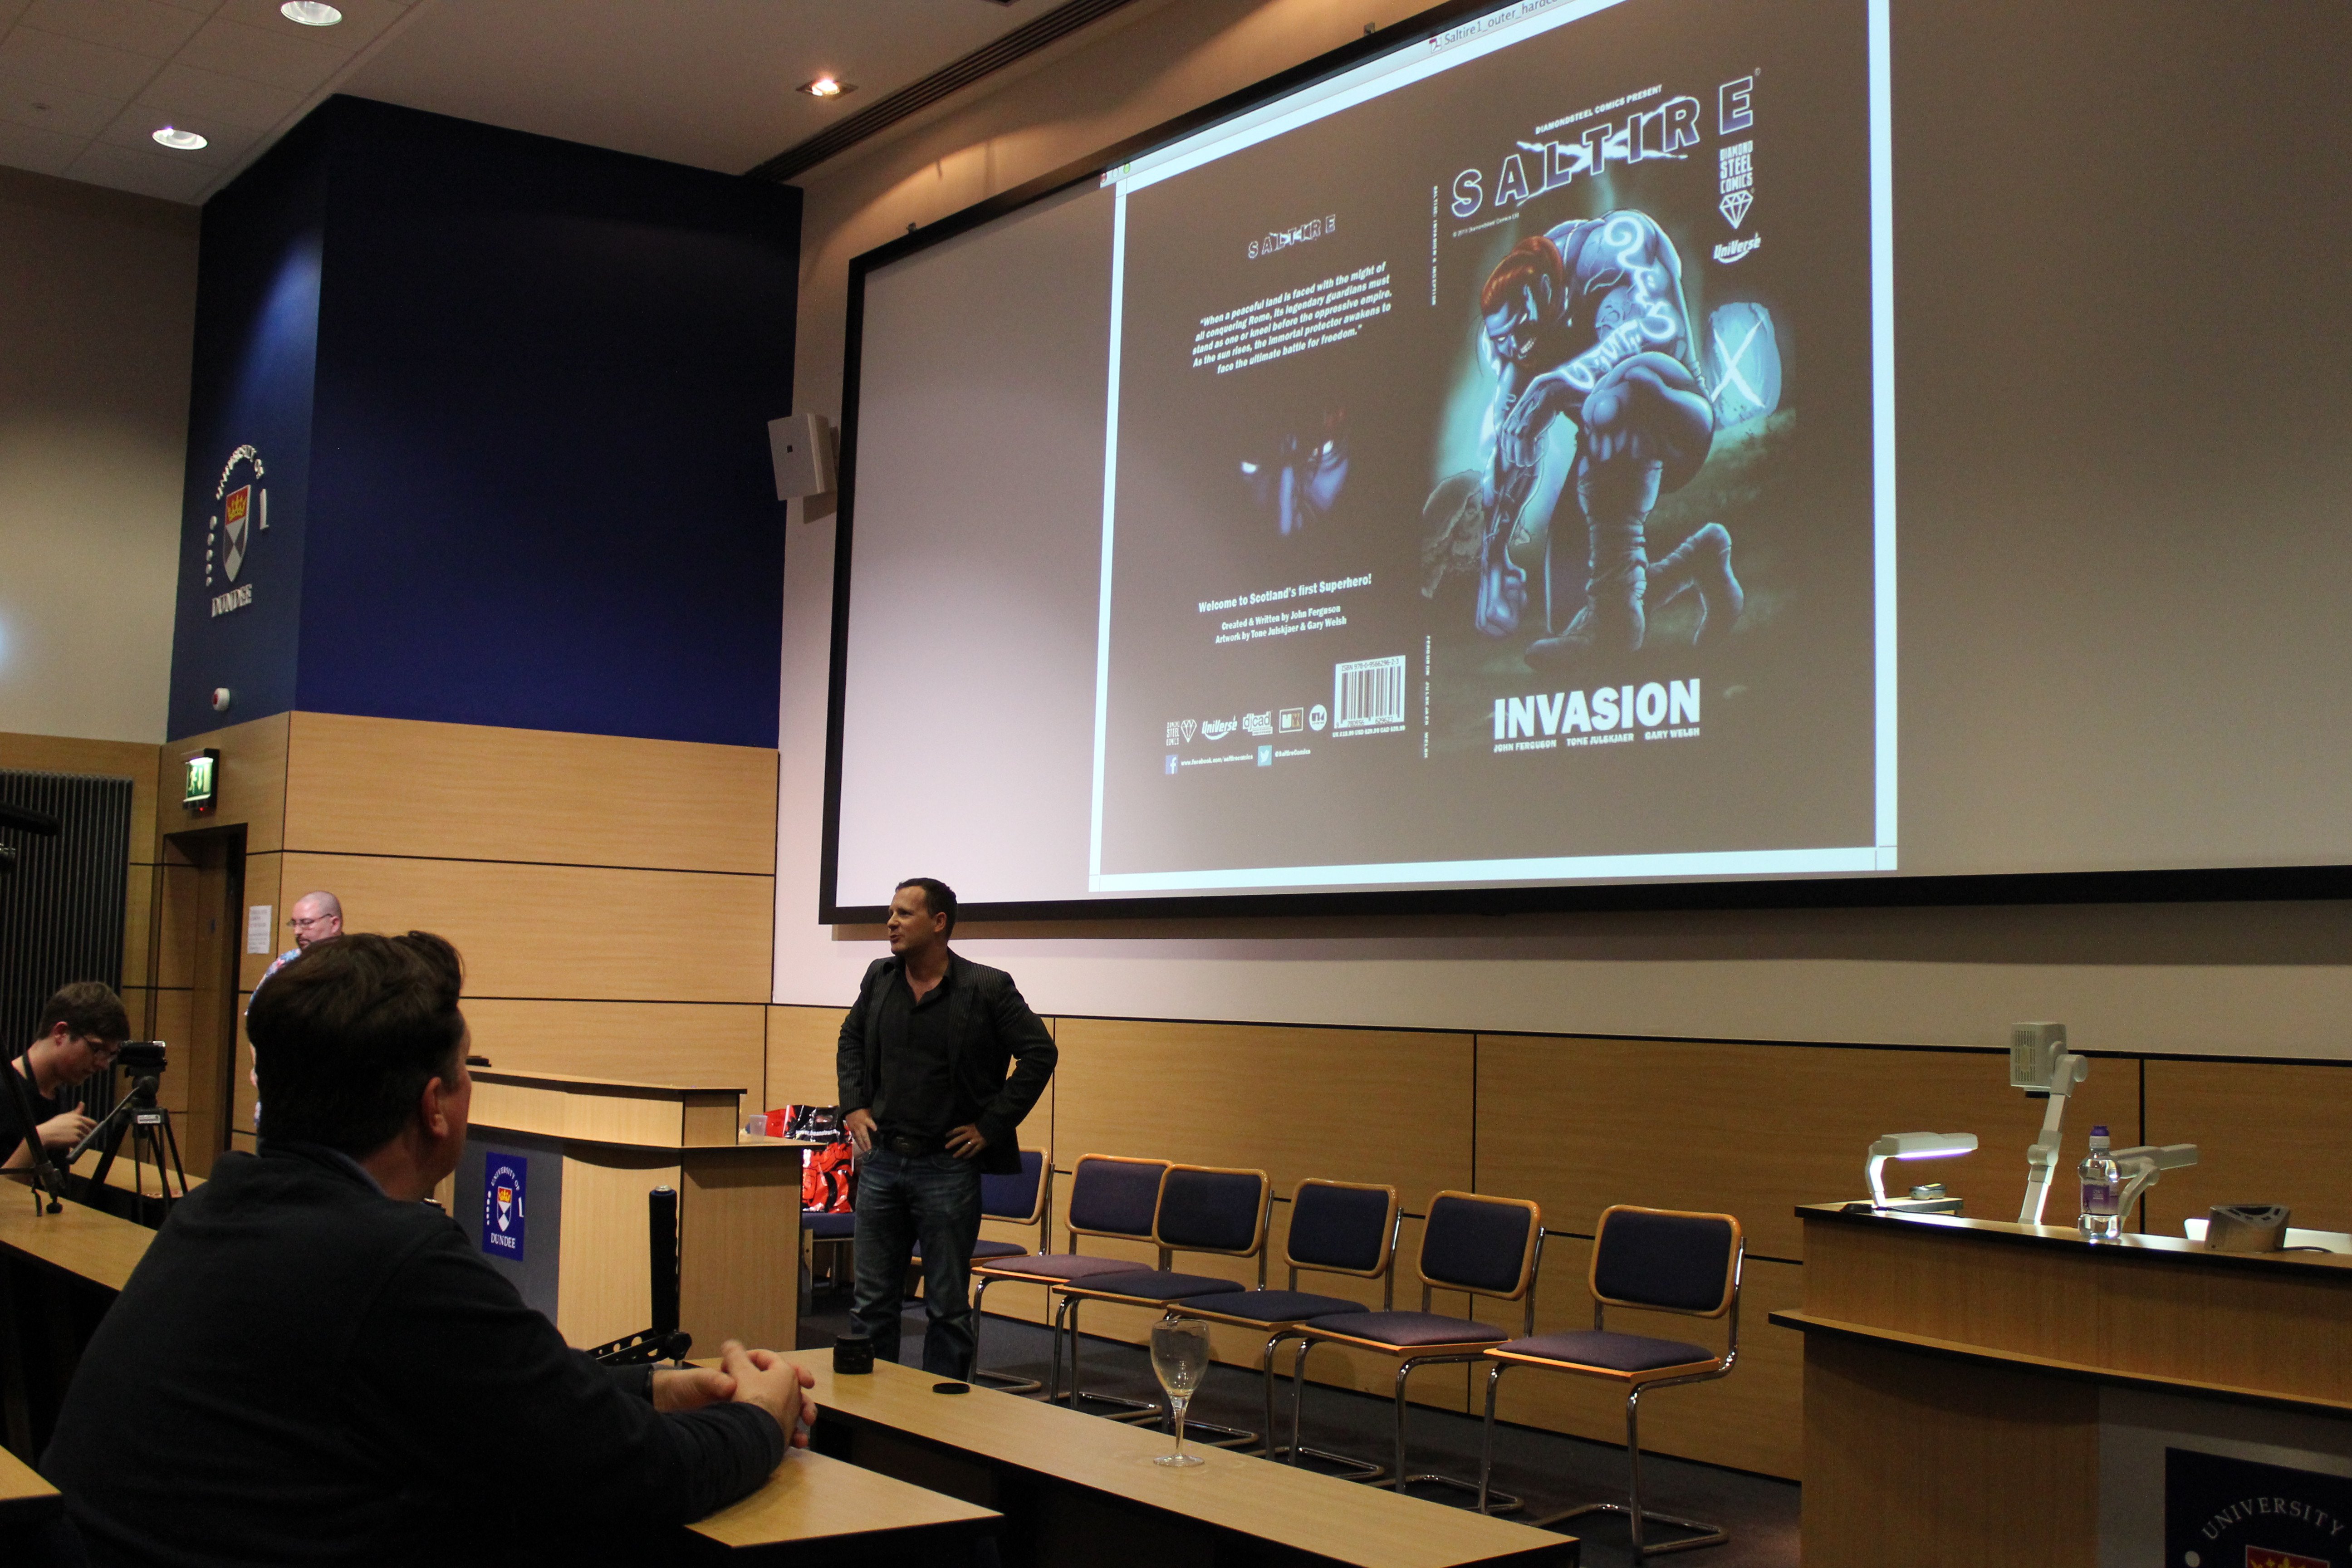 John Ferguson saltire comic book